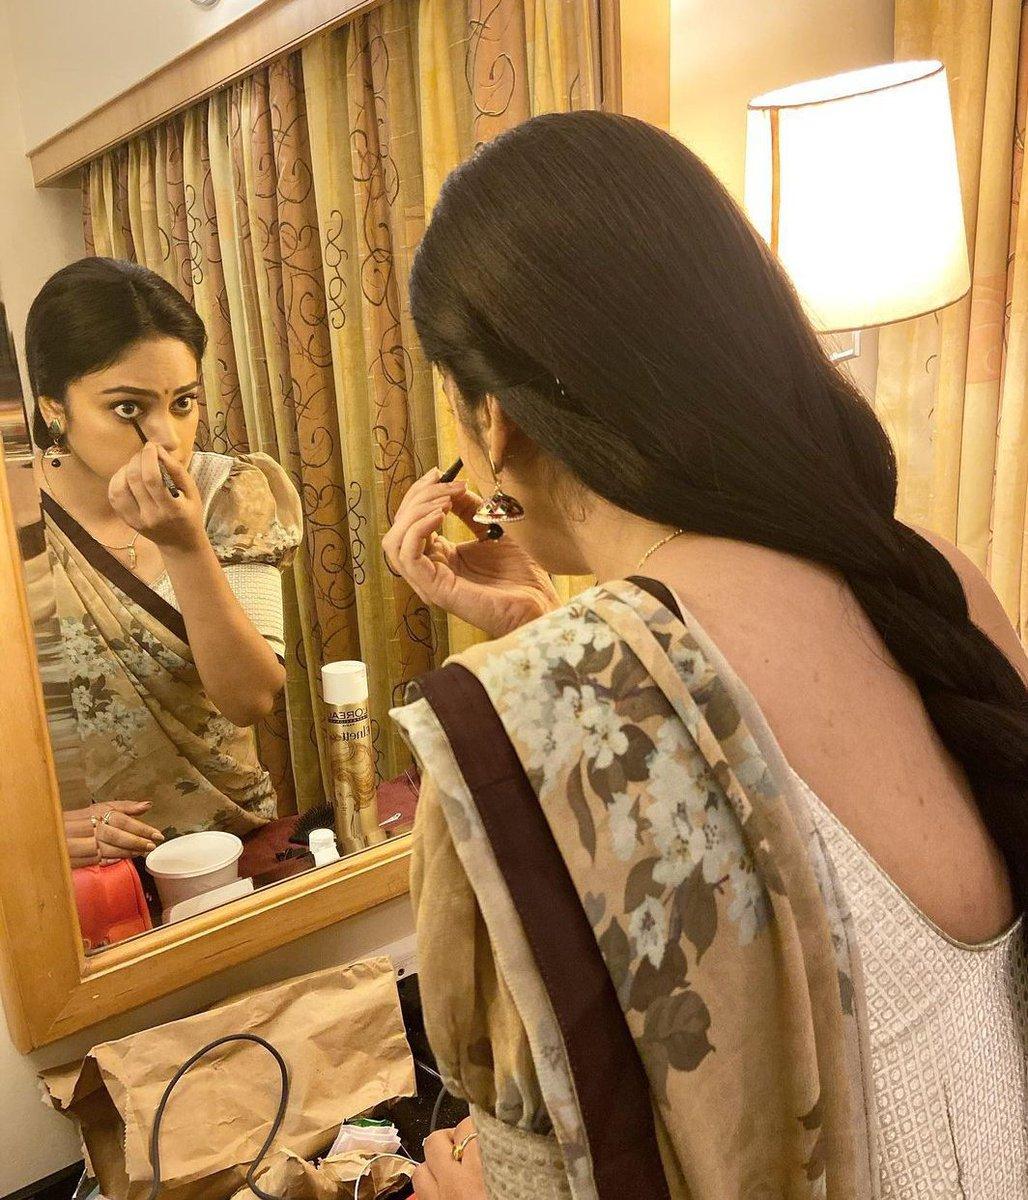 @V6_Suresh @Nanditasweta @SilambarasanTR_ Cuteness 🤳🤳👌👌👌 #SilambarasanTR #Maanaadu #Eeshwaran #NanditaSwetha all the best 😍 https://t.co/M0sP9GqtsN